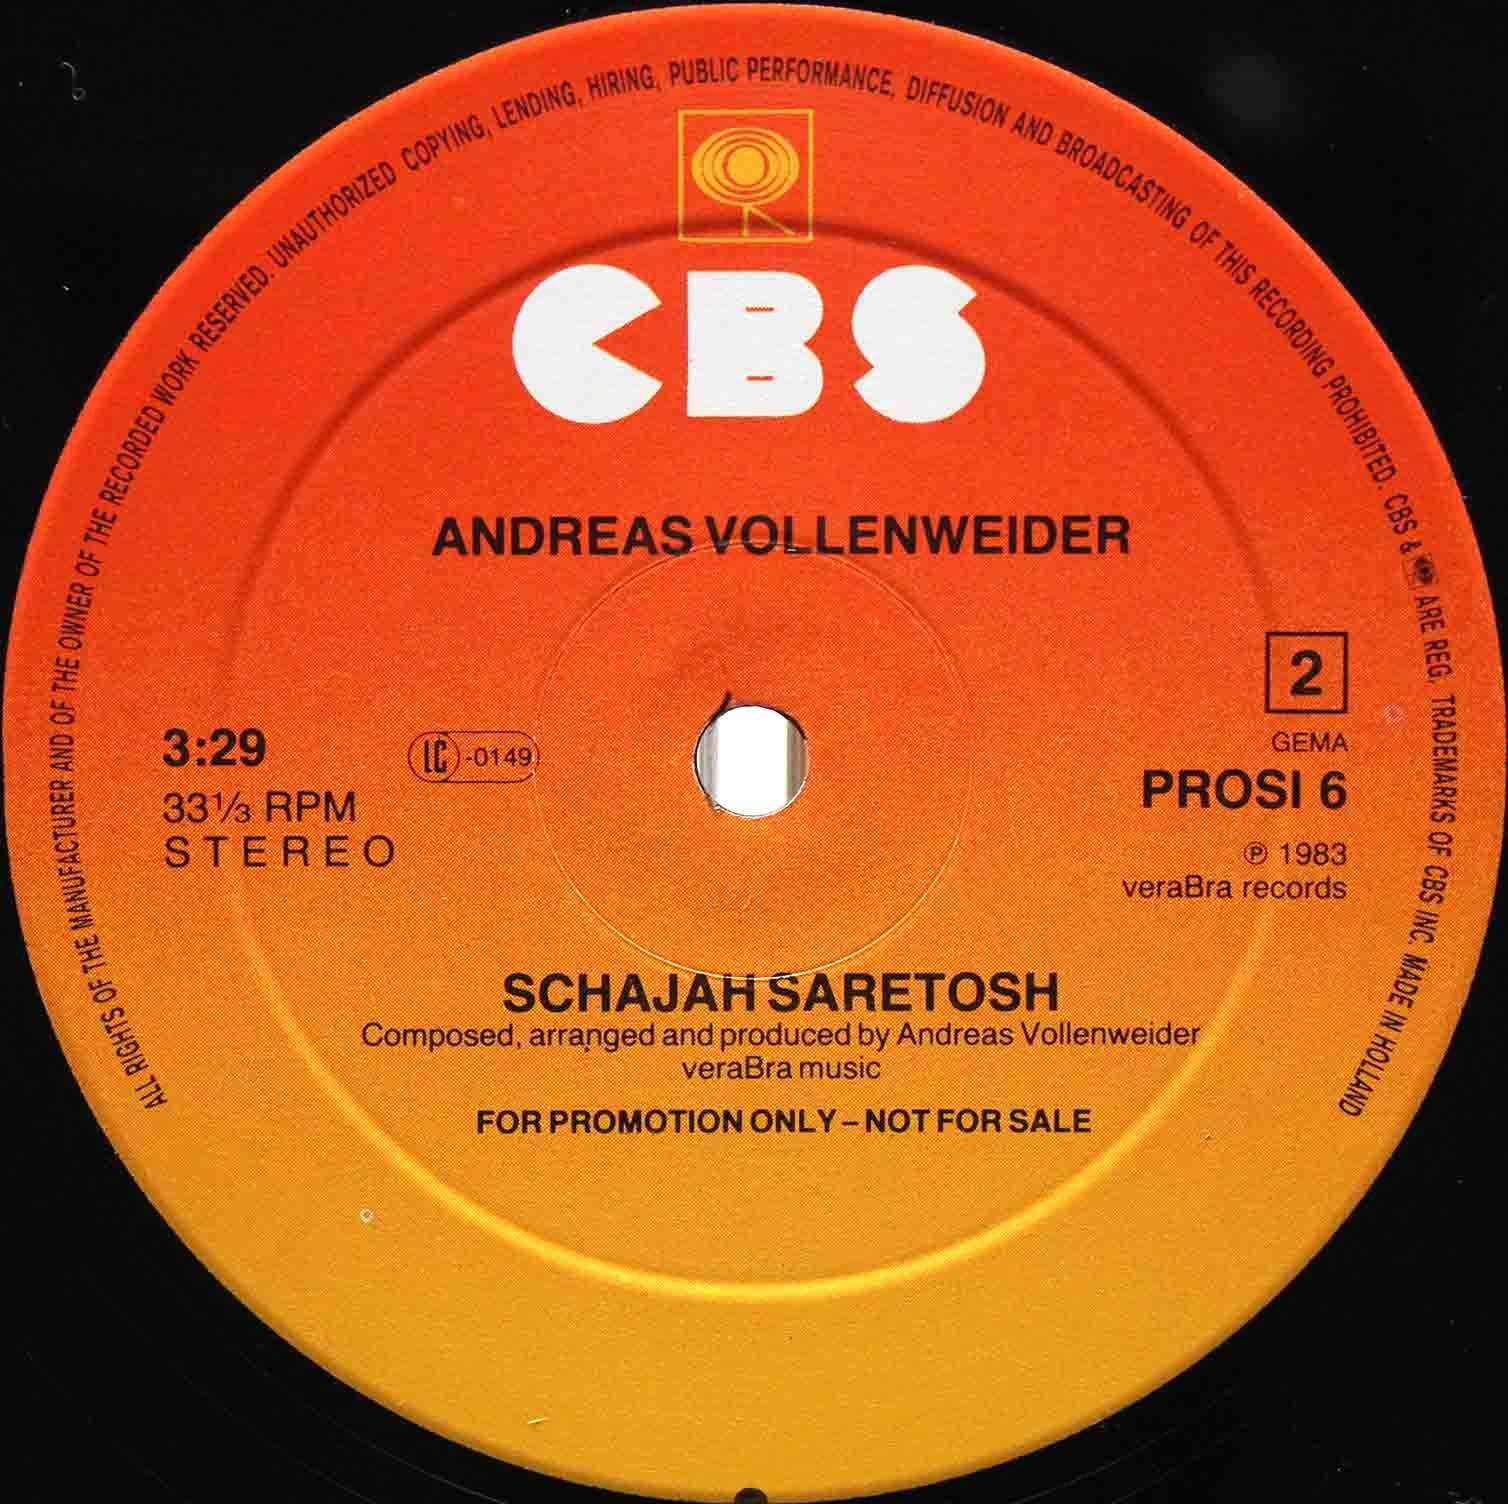 Andreas Vollenweider – Belladonna 04